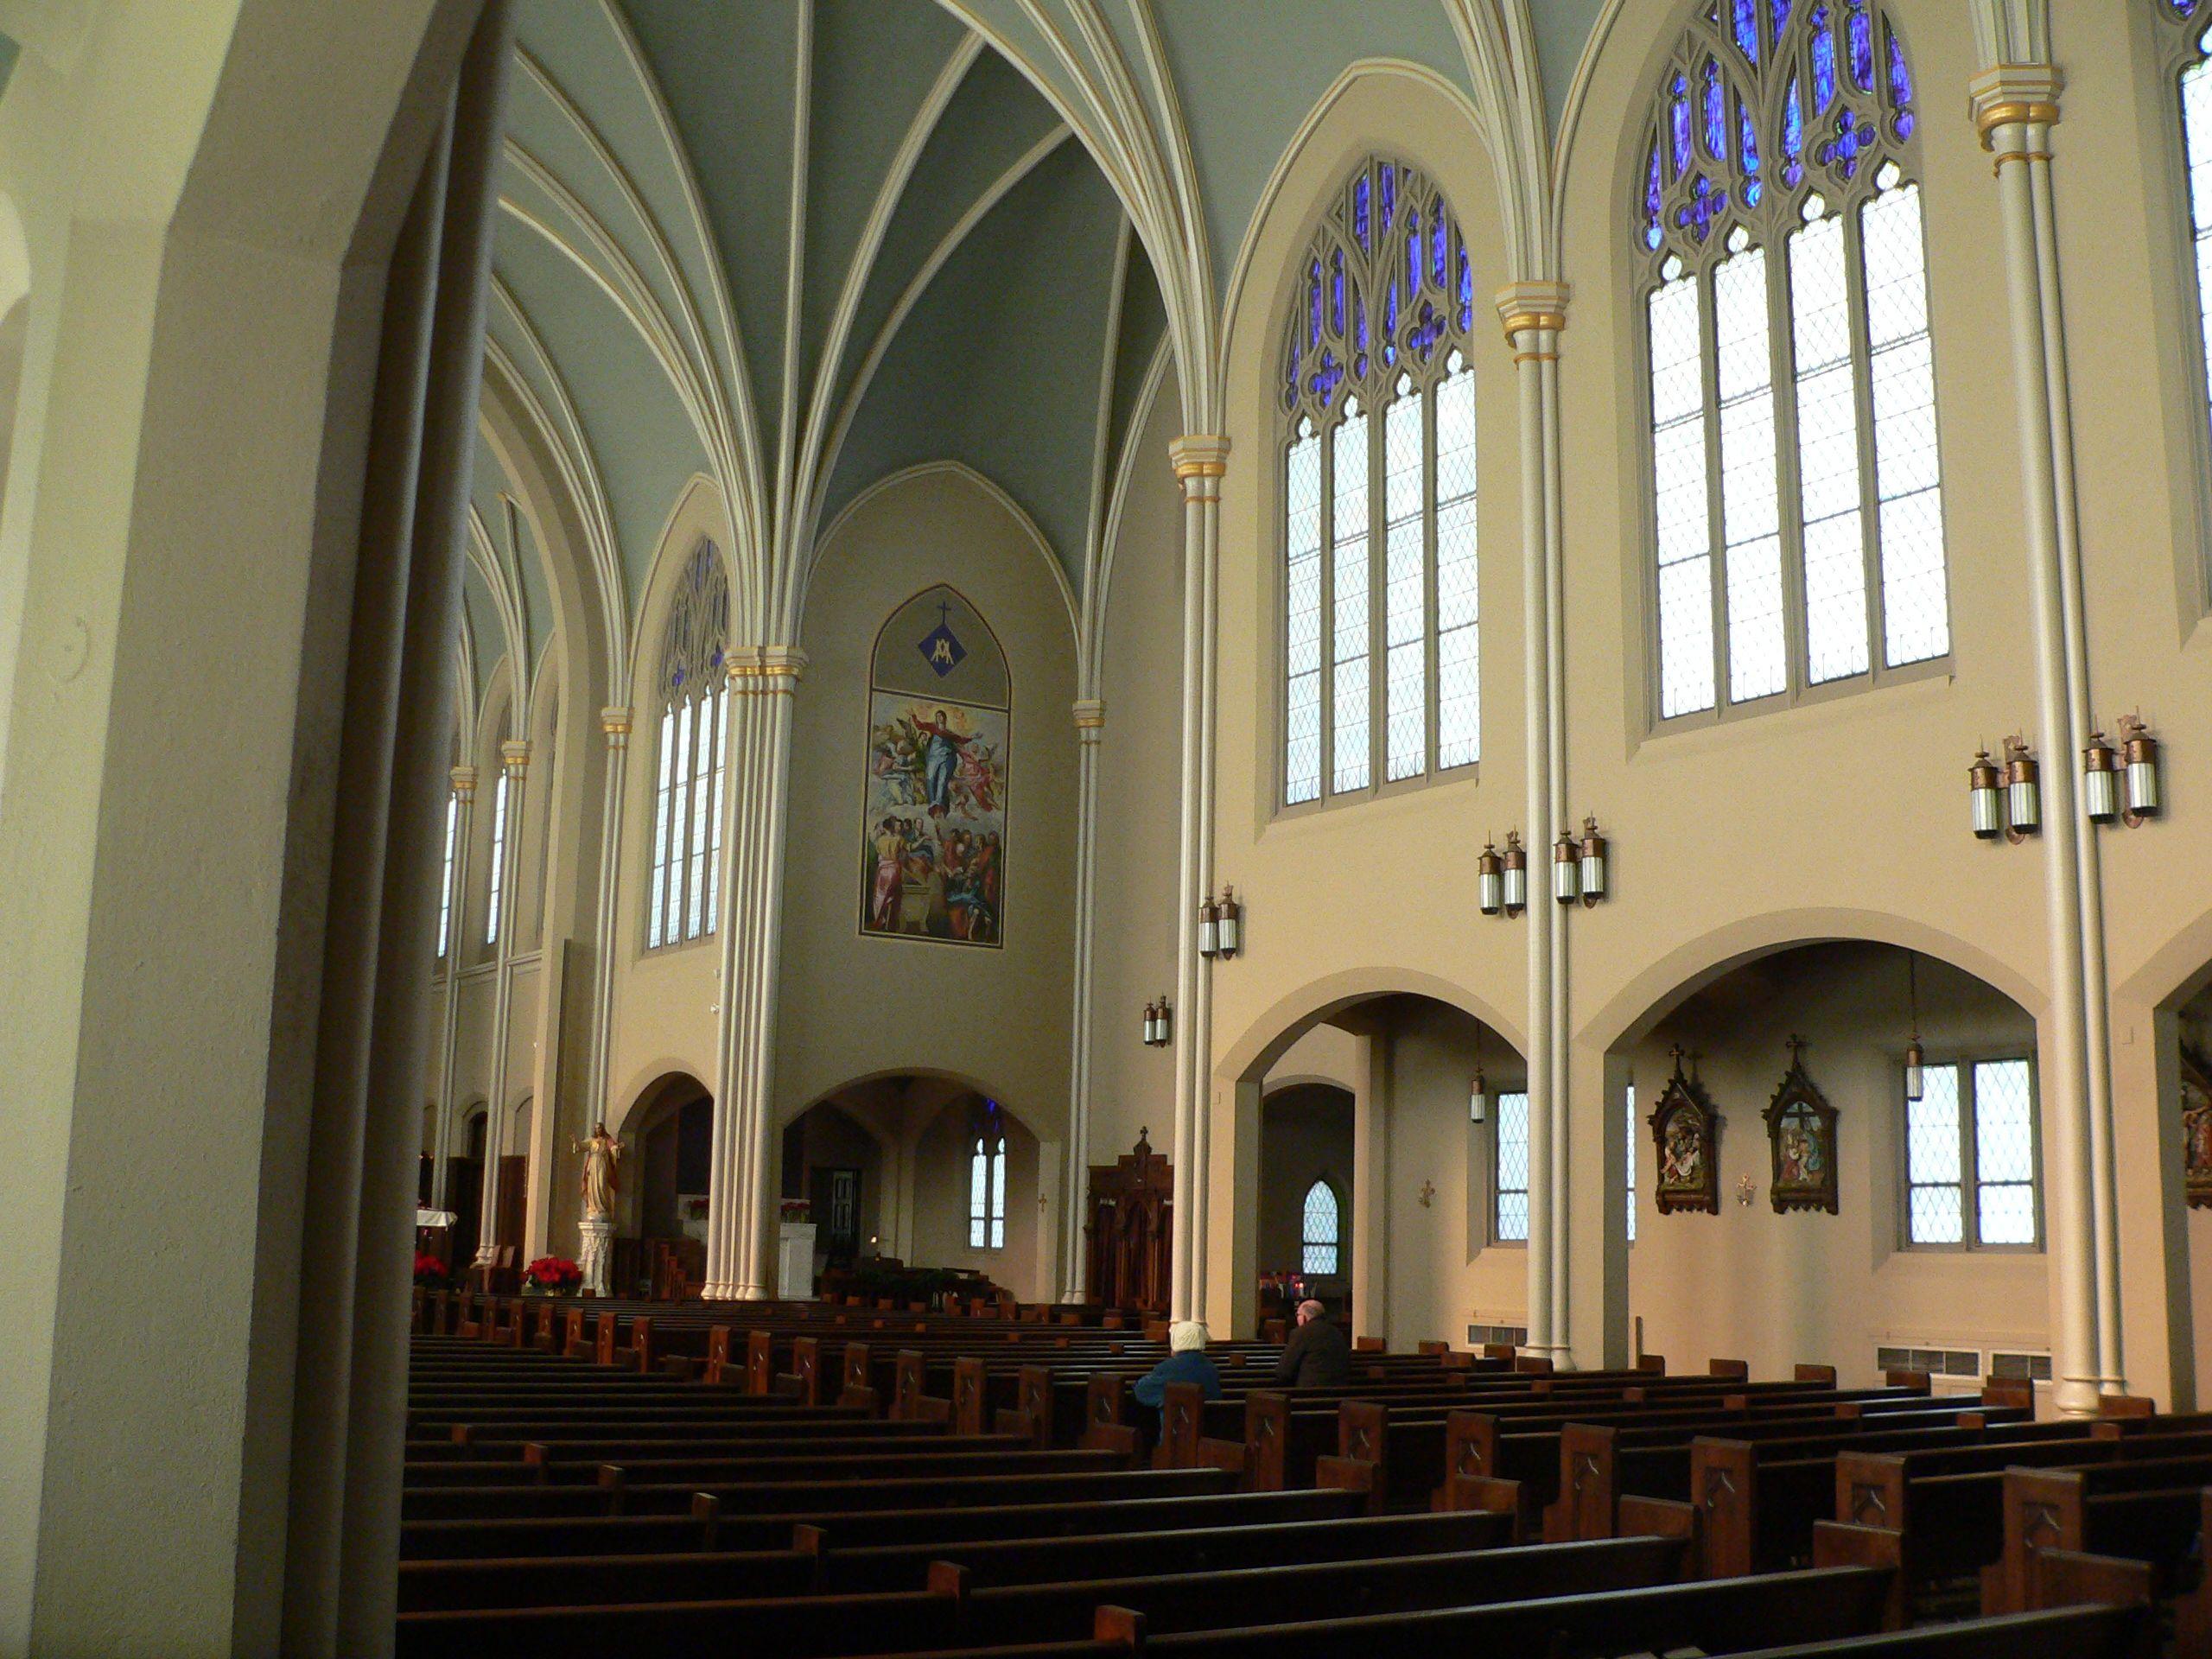 Cathedra mobili ~ Nebraska nativity of the blessed virgin mary catholic cathedral